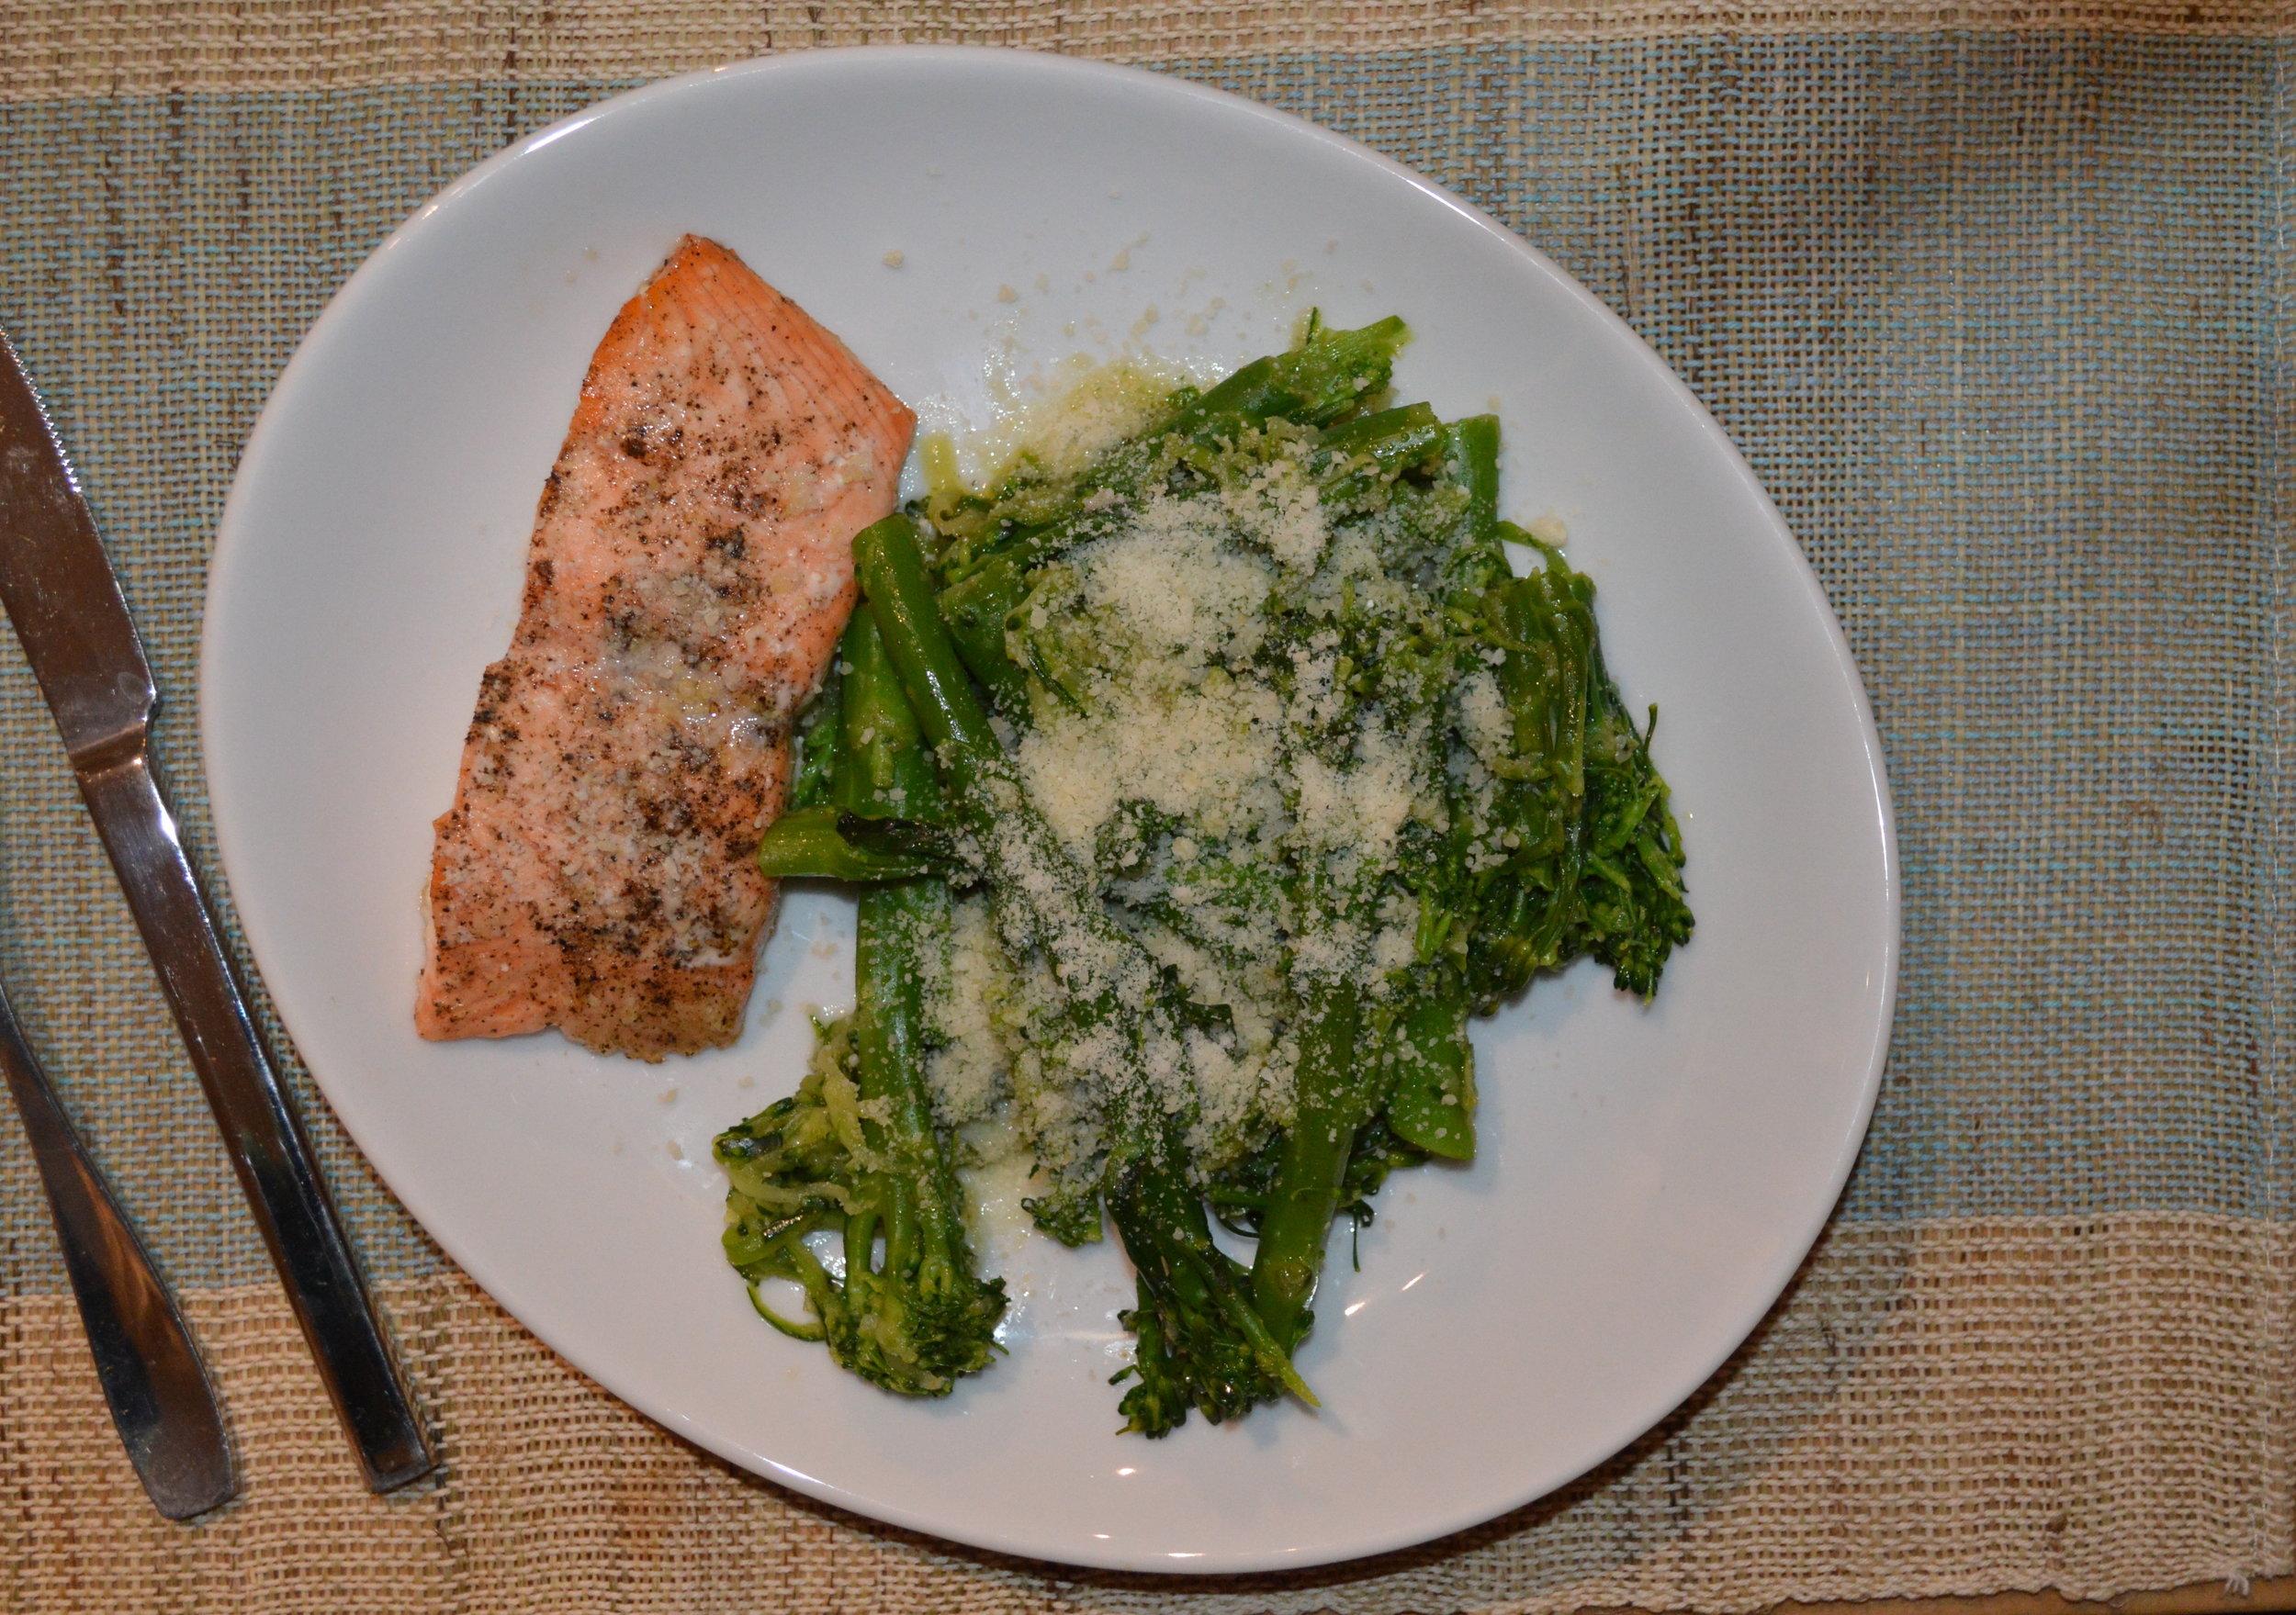 salmon and broccolini.JPG